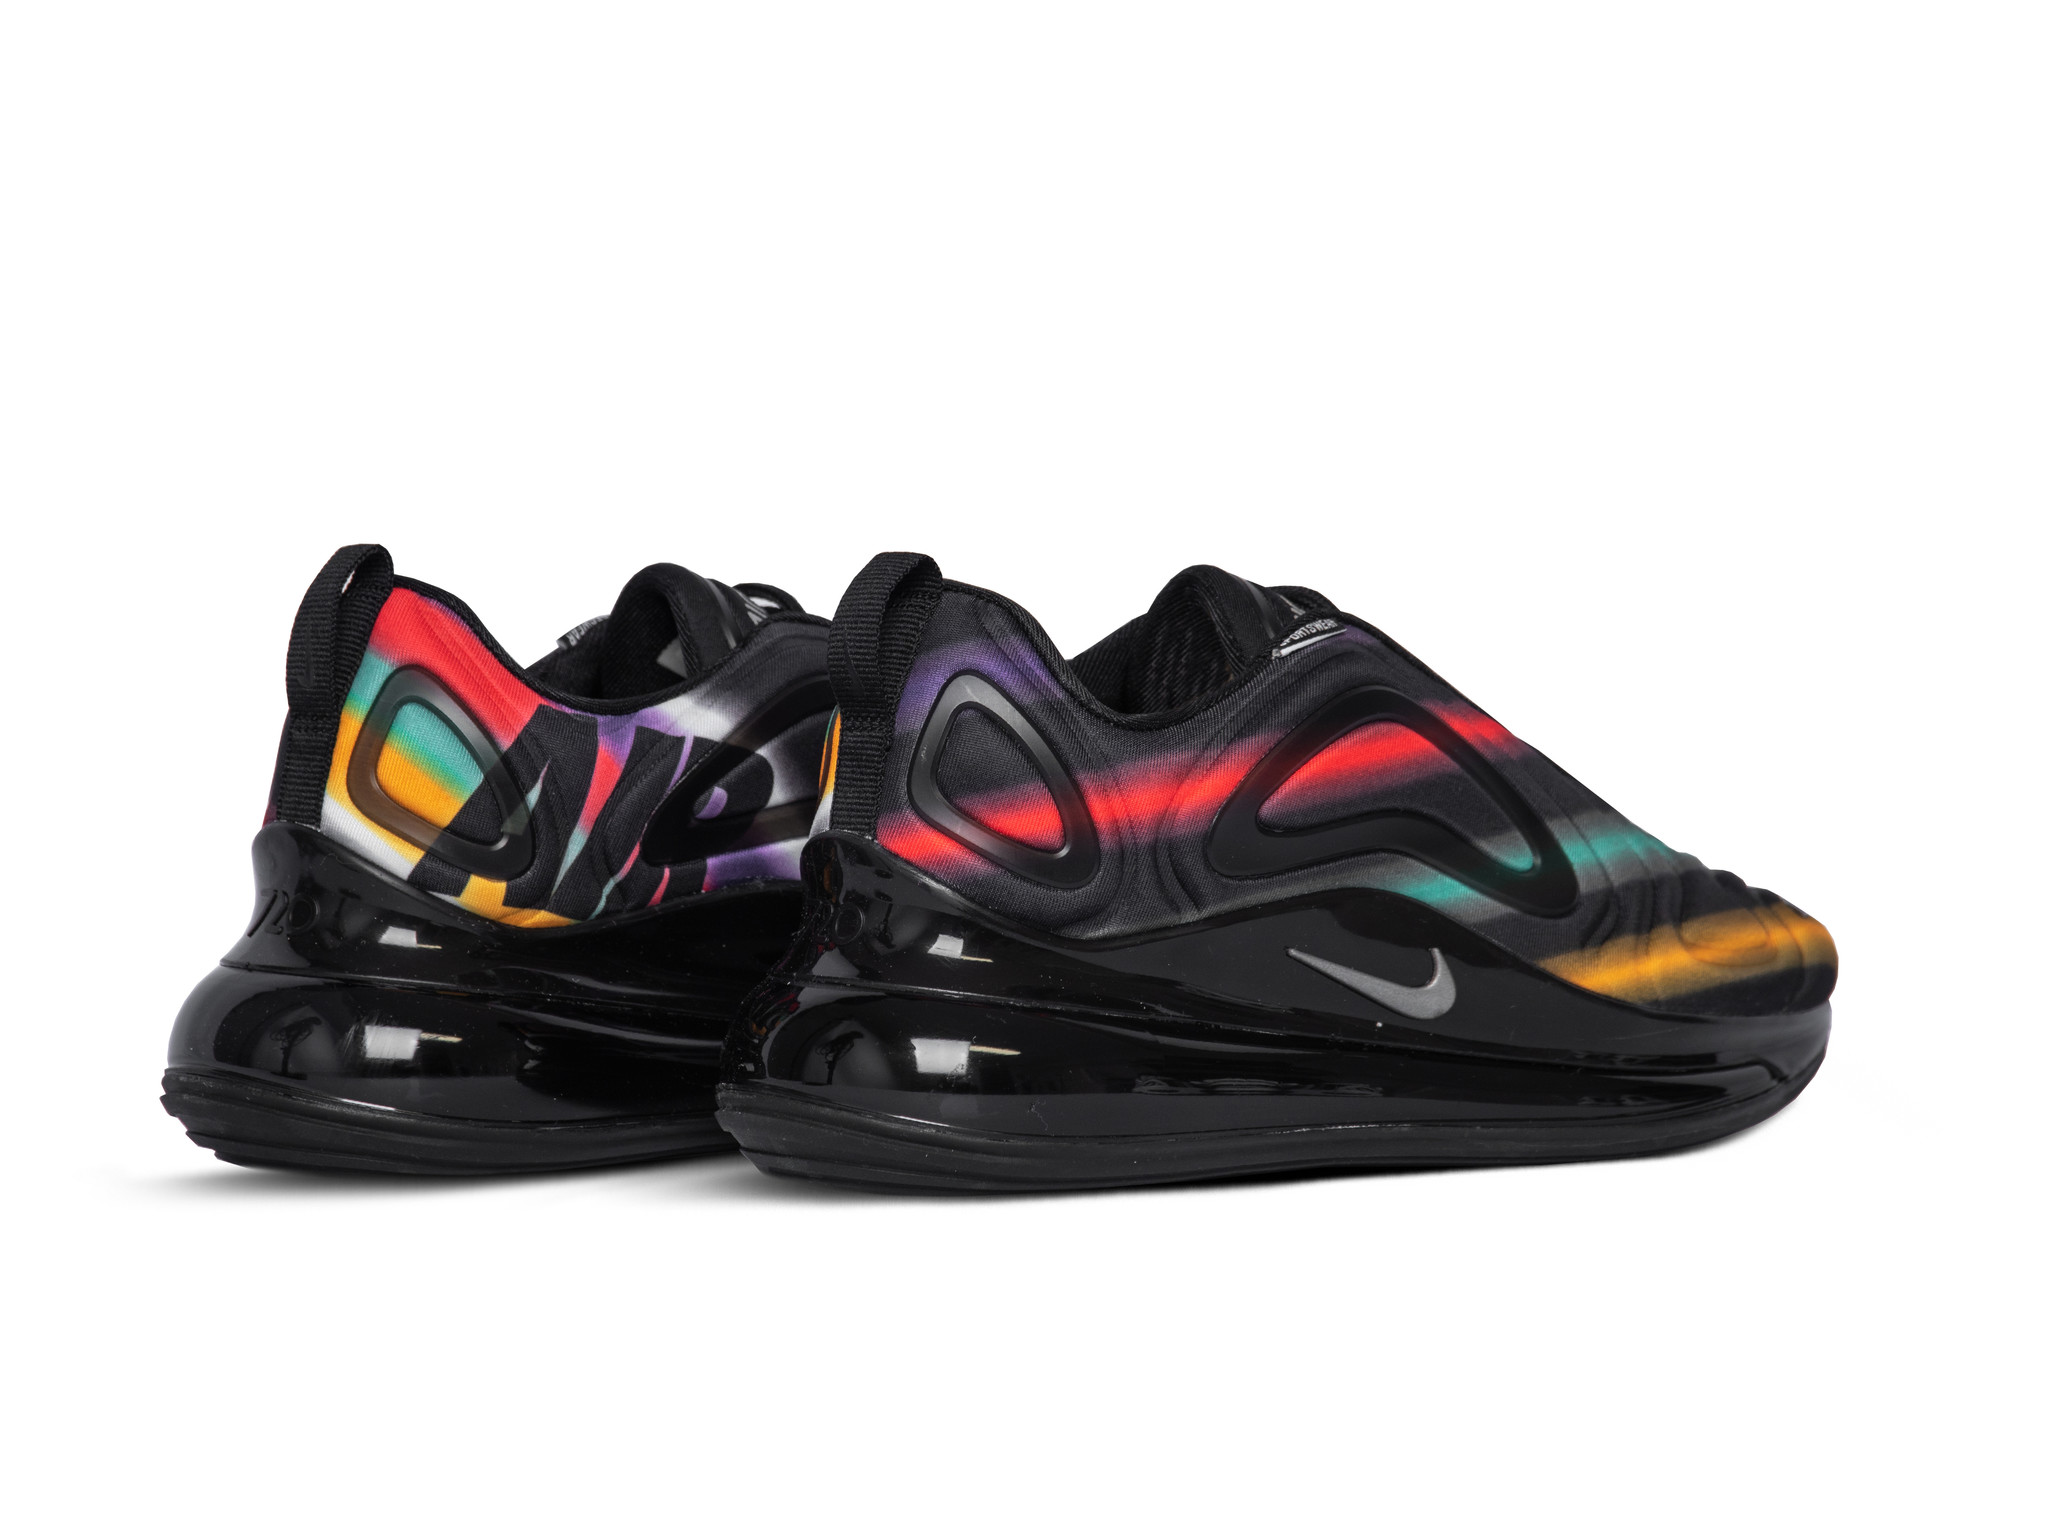 Nike Air Max 720 Triple BlackAnthracite Women's Running Shoes AR9293 007